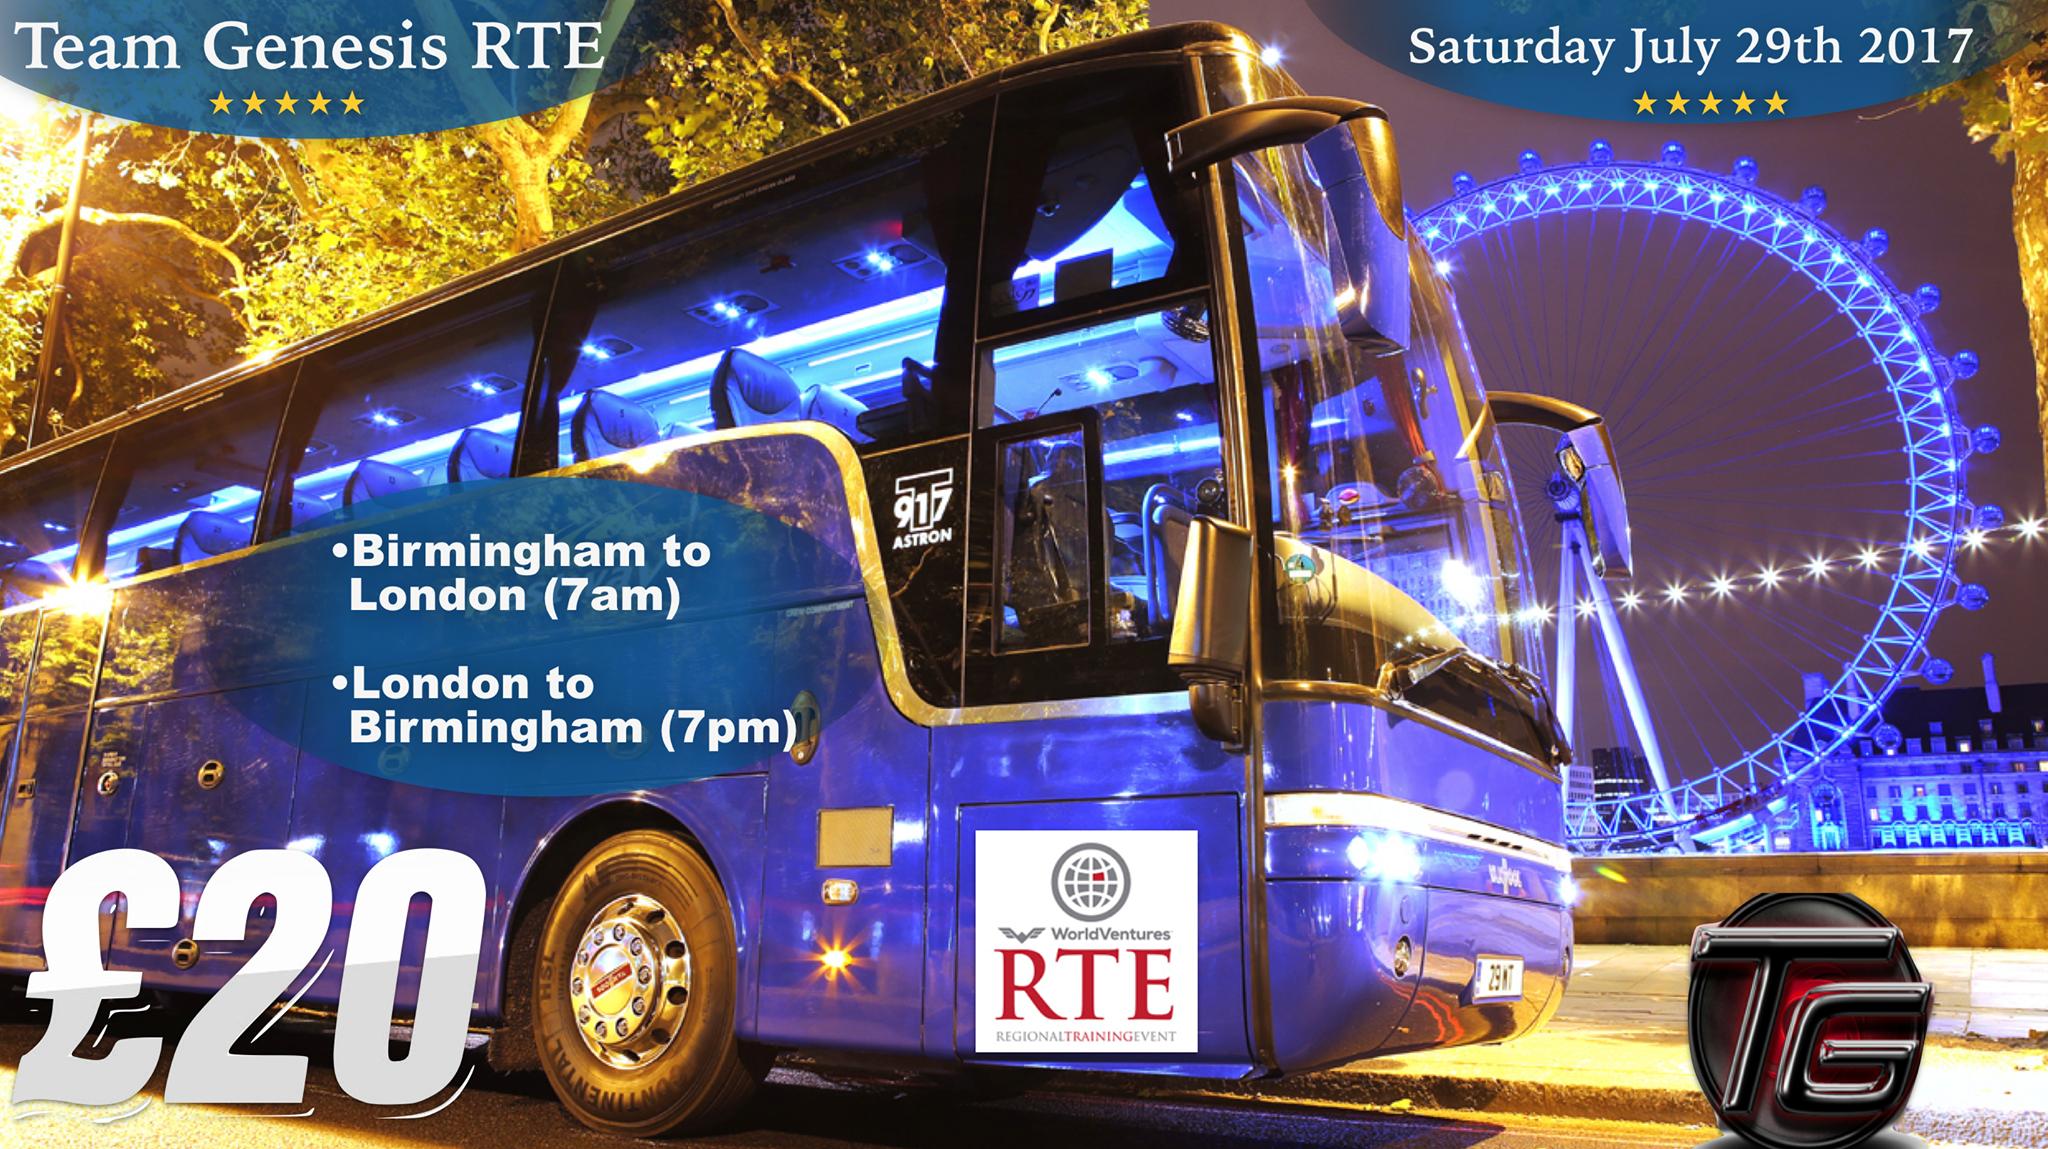 Bus transport for Regional Training Event - London, GB